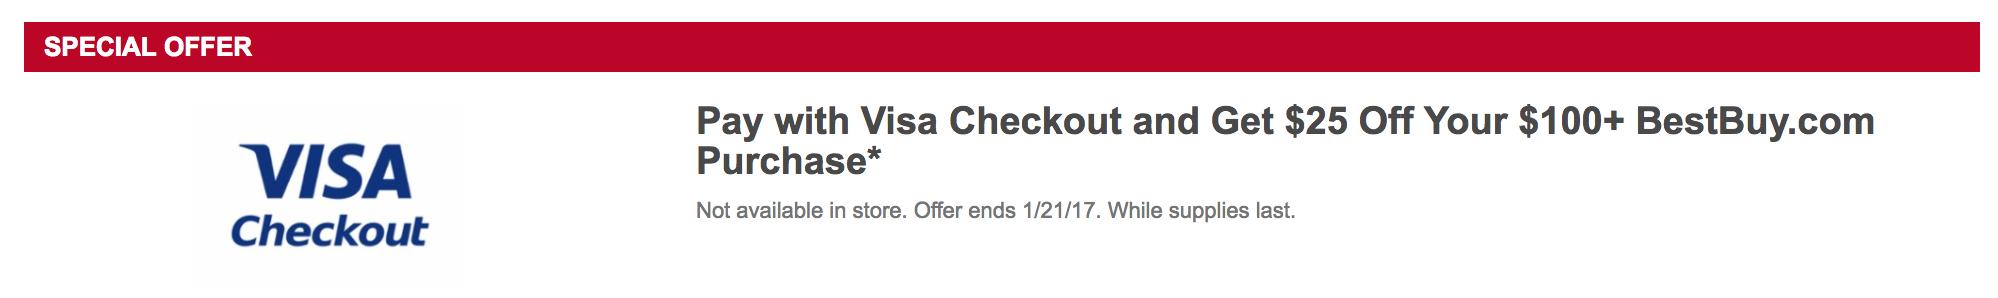 visa-checkout-best-buy-25-off-100